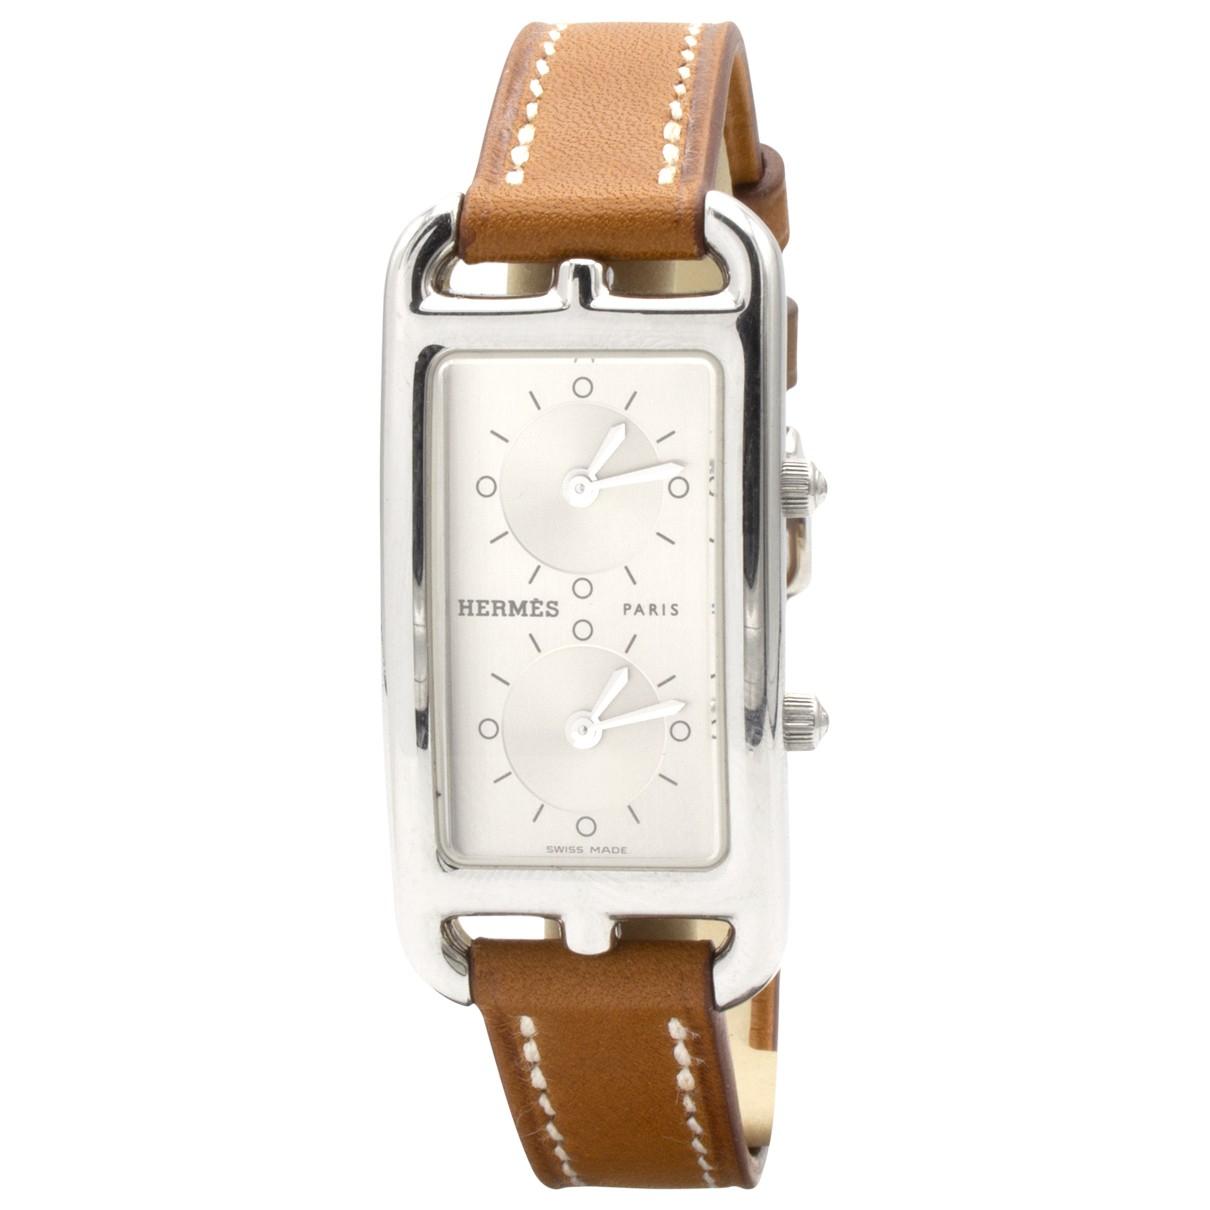 Reloj Cape Cod Dual Time Hermes